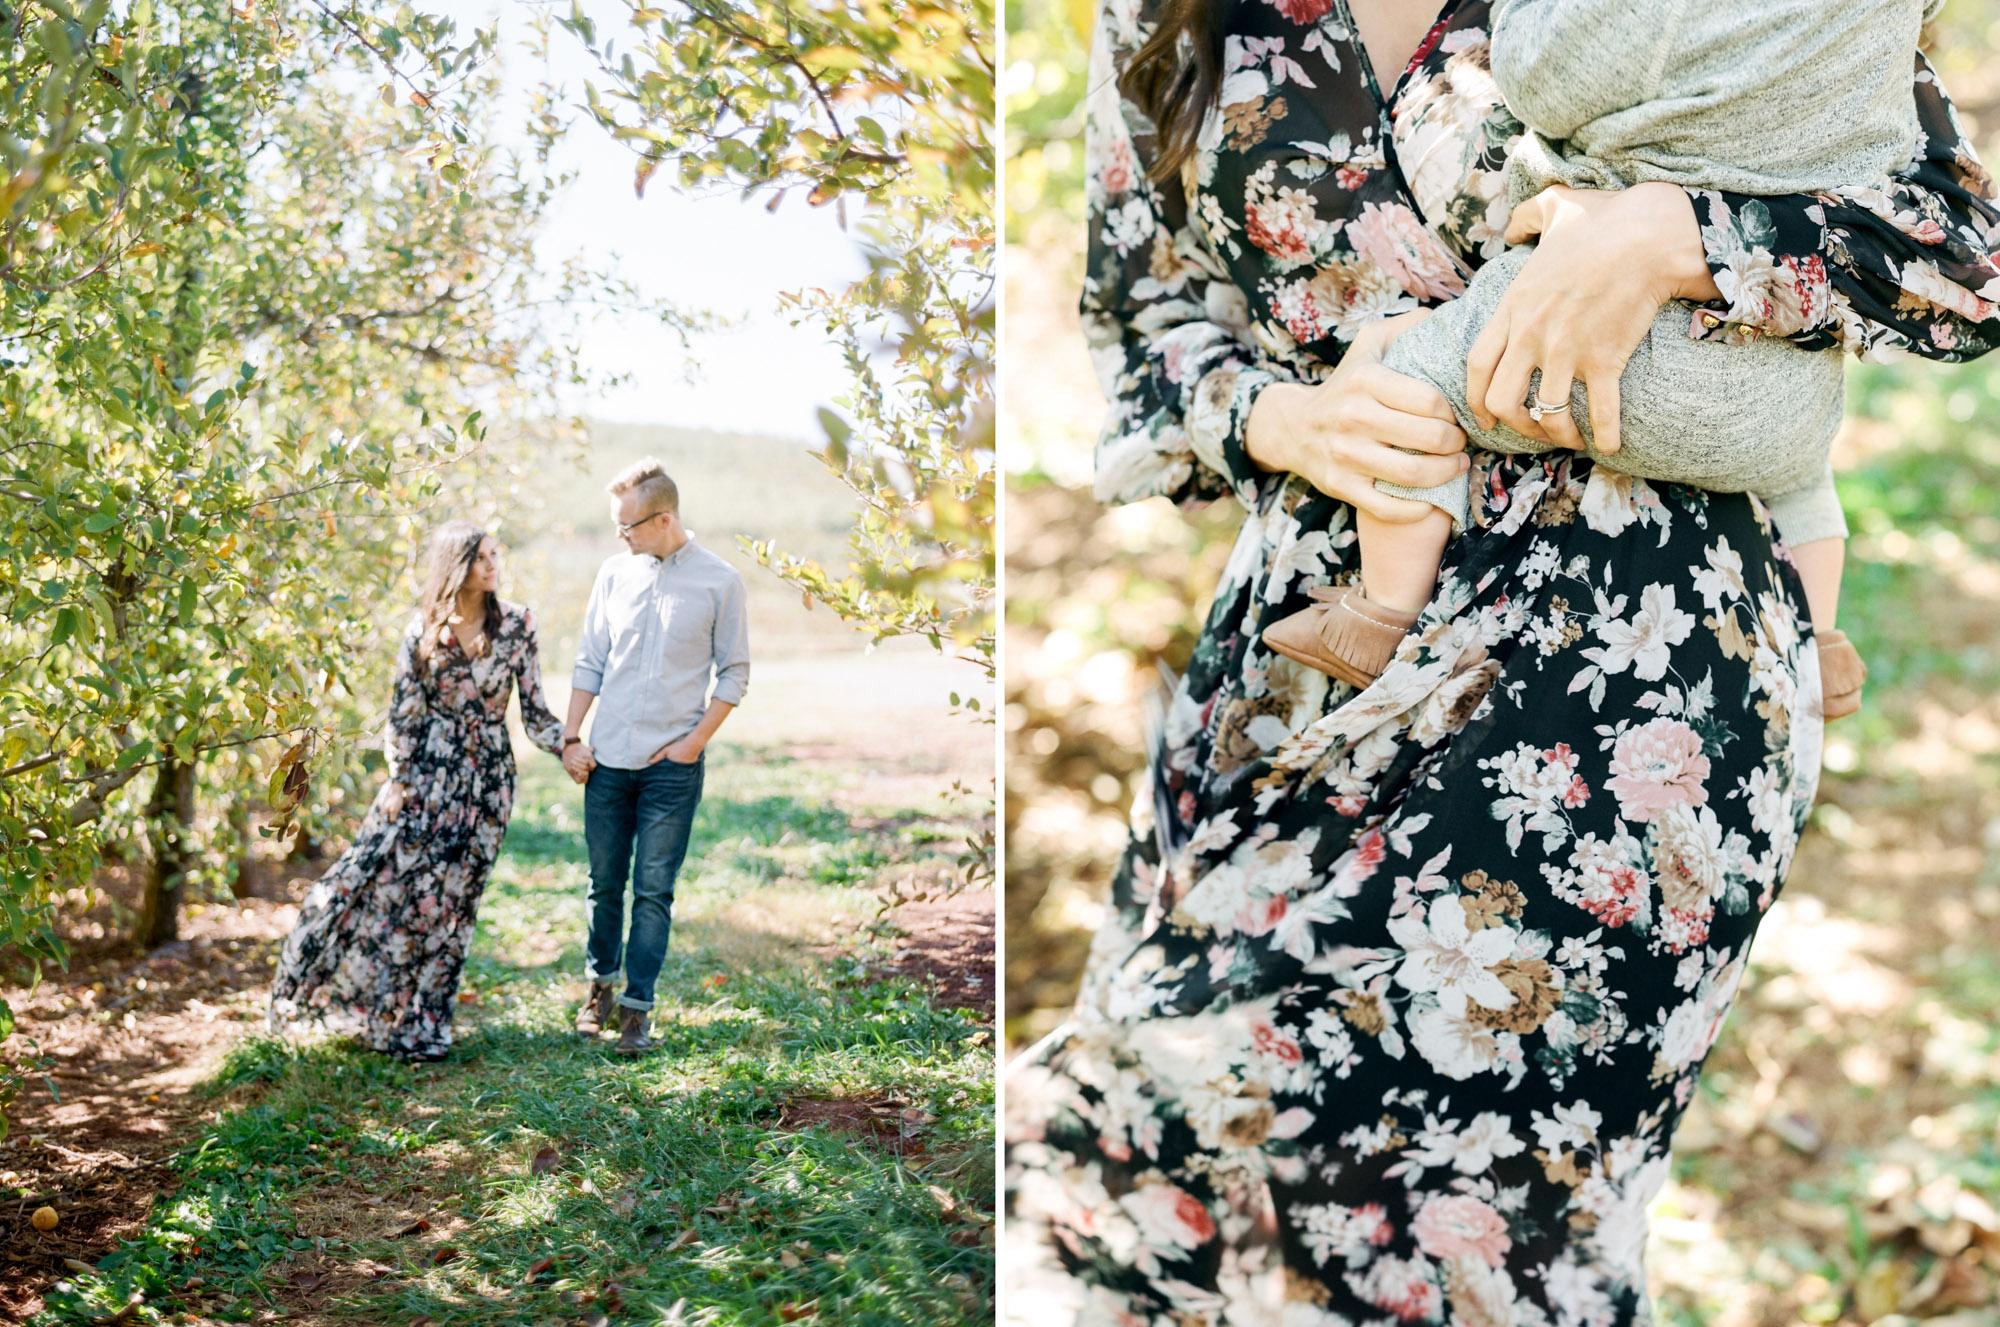 Charlottesville_Charlotte_North_Carolina_Richmond_Virginia_Family_Wedding_Film_Photographer-49.jpg